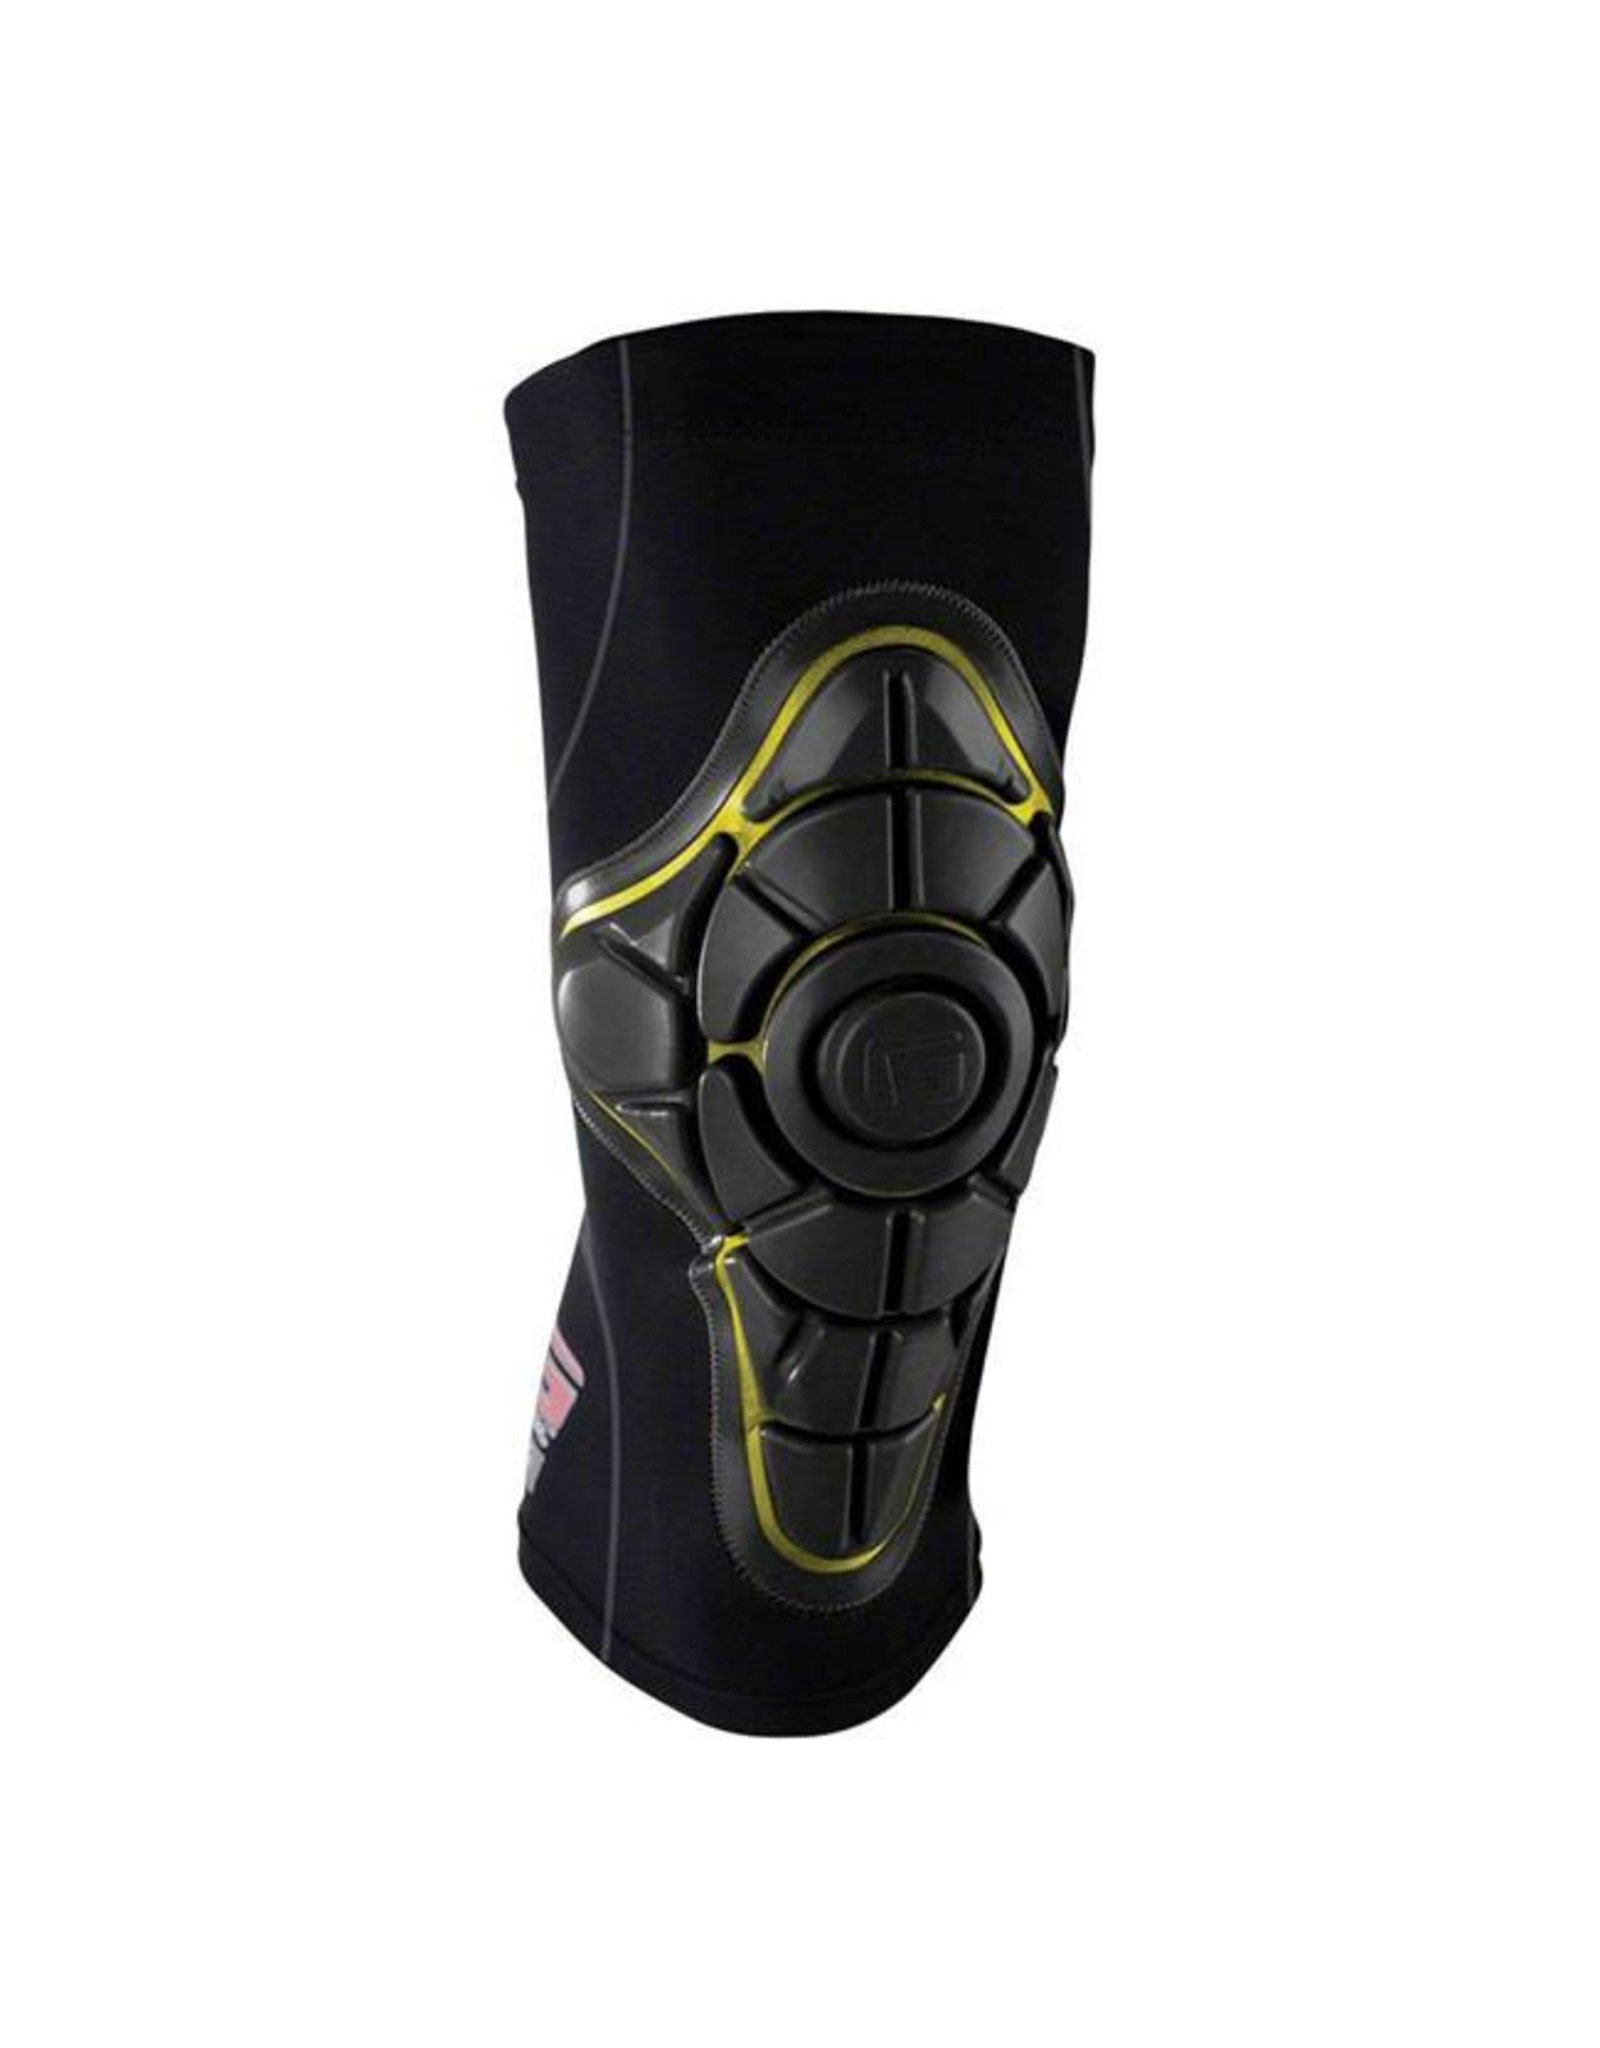 G-Form G-Form Pro-X Knee Pad: Black/Yellow XS